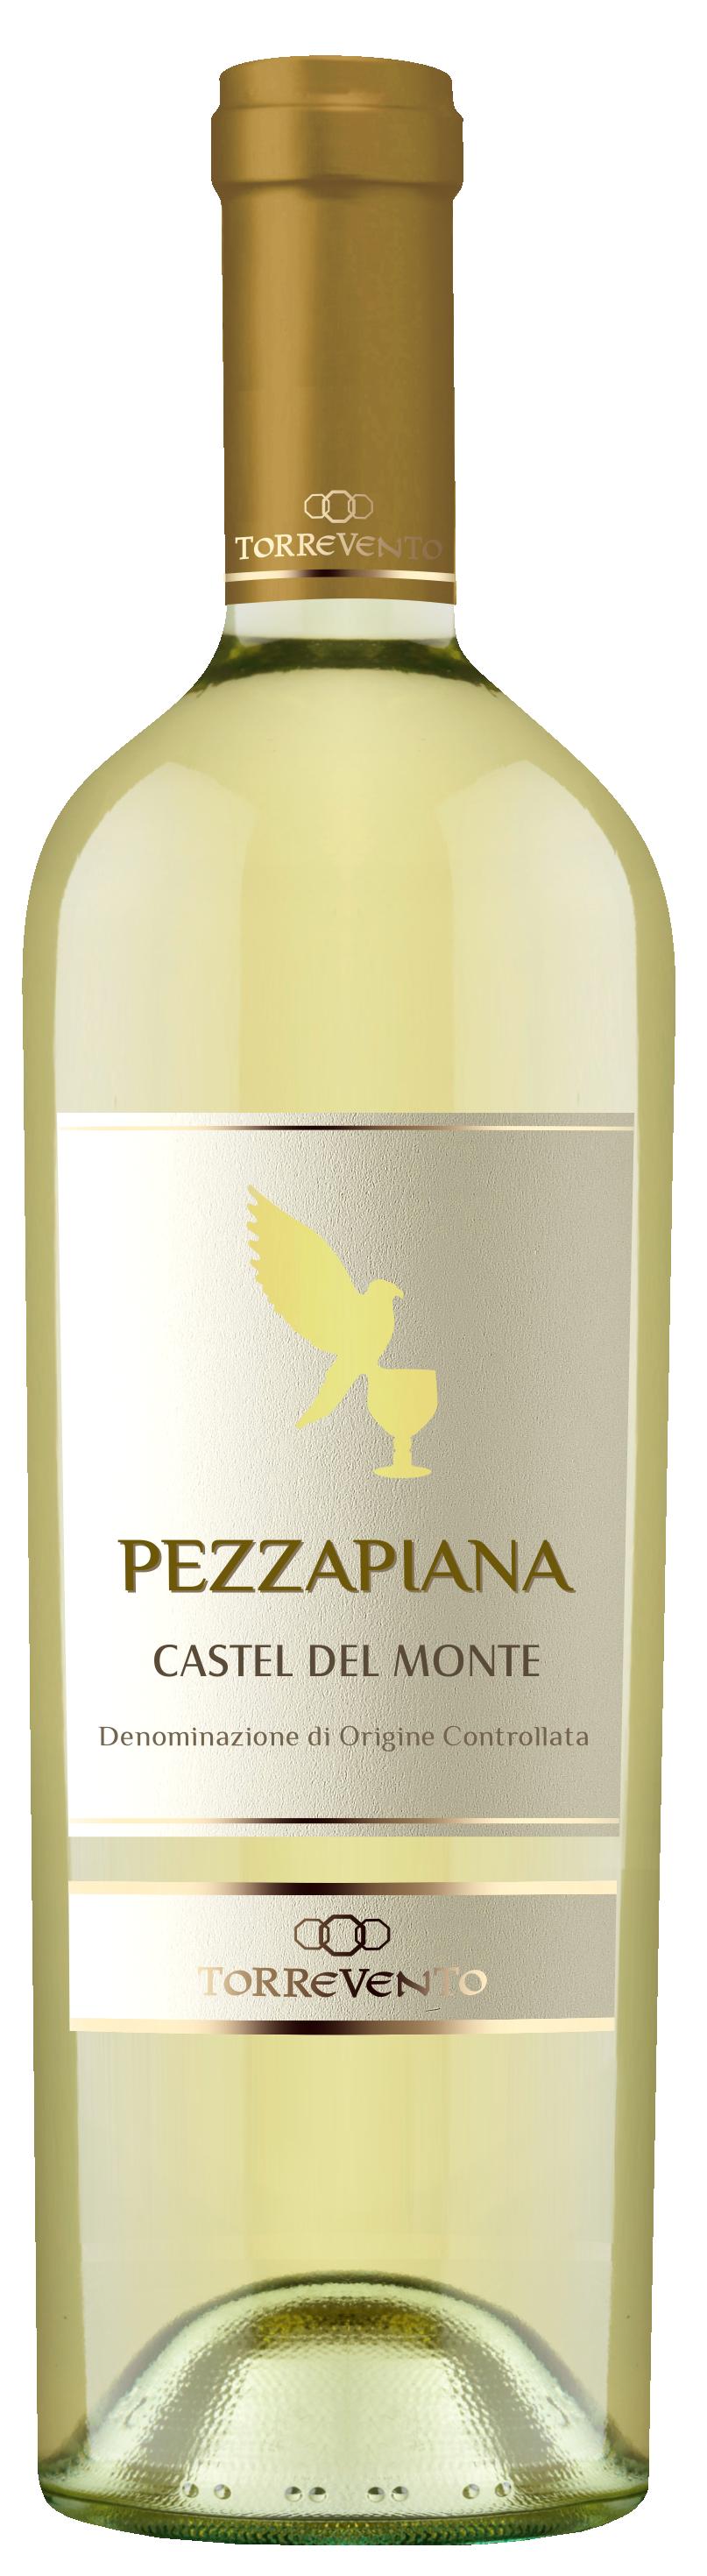 Pezzapiana-Bianco